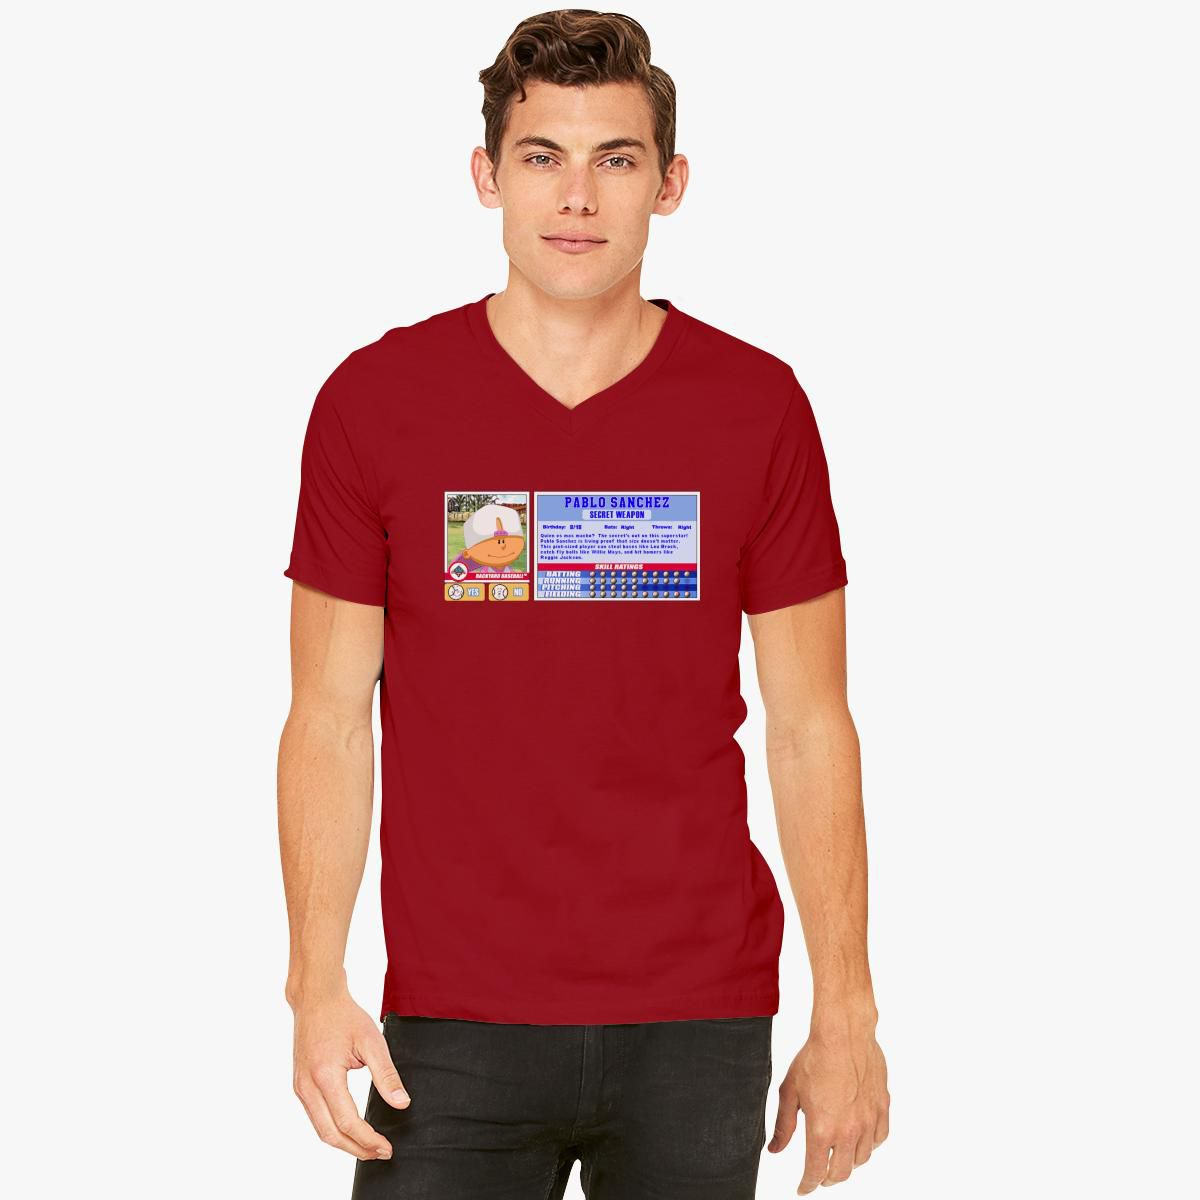 Pablo Sanchez - Backyard Baseball Stat Card V-Neck T-shirt ...